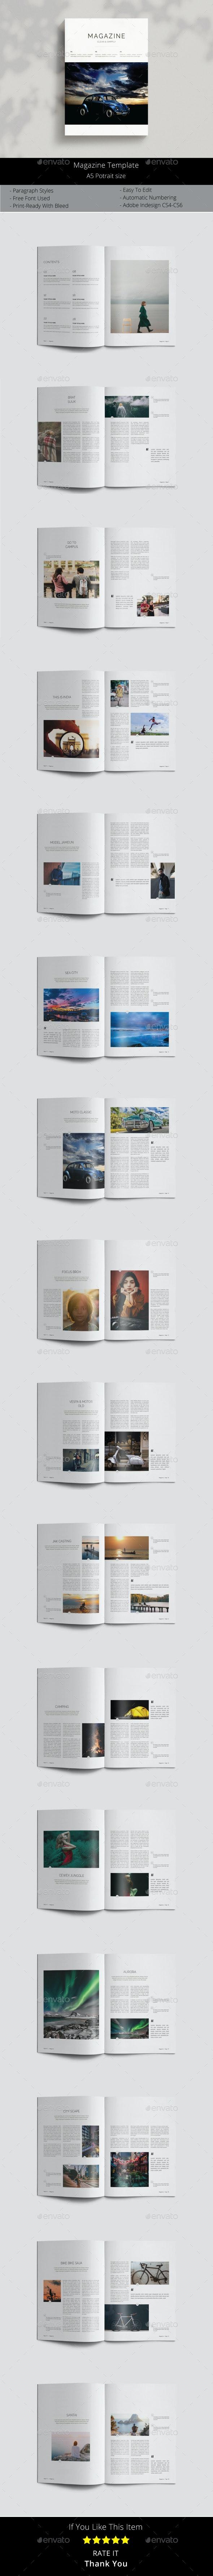 A5 Magazine Template - Magazines Print Templates